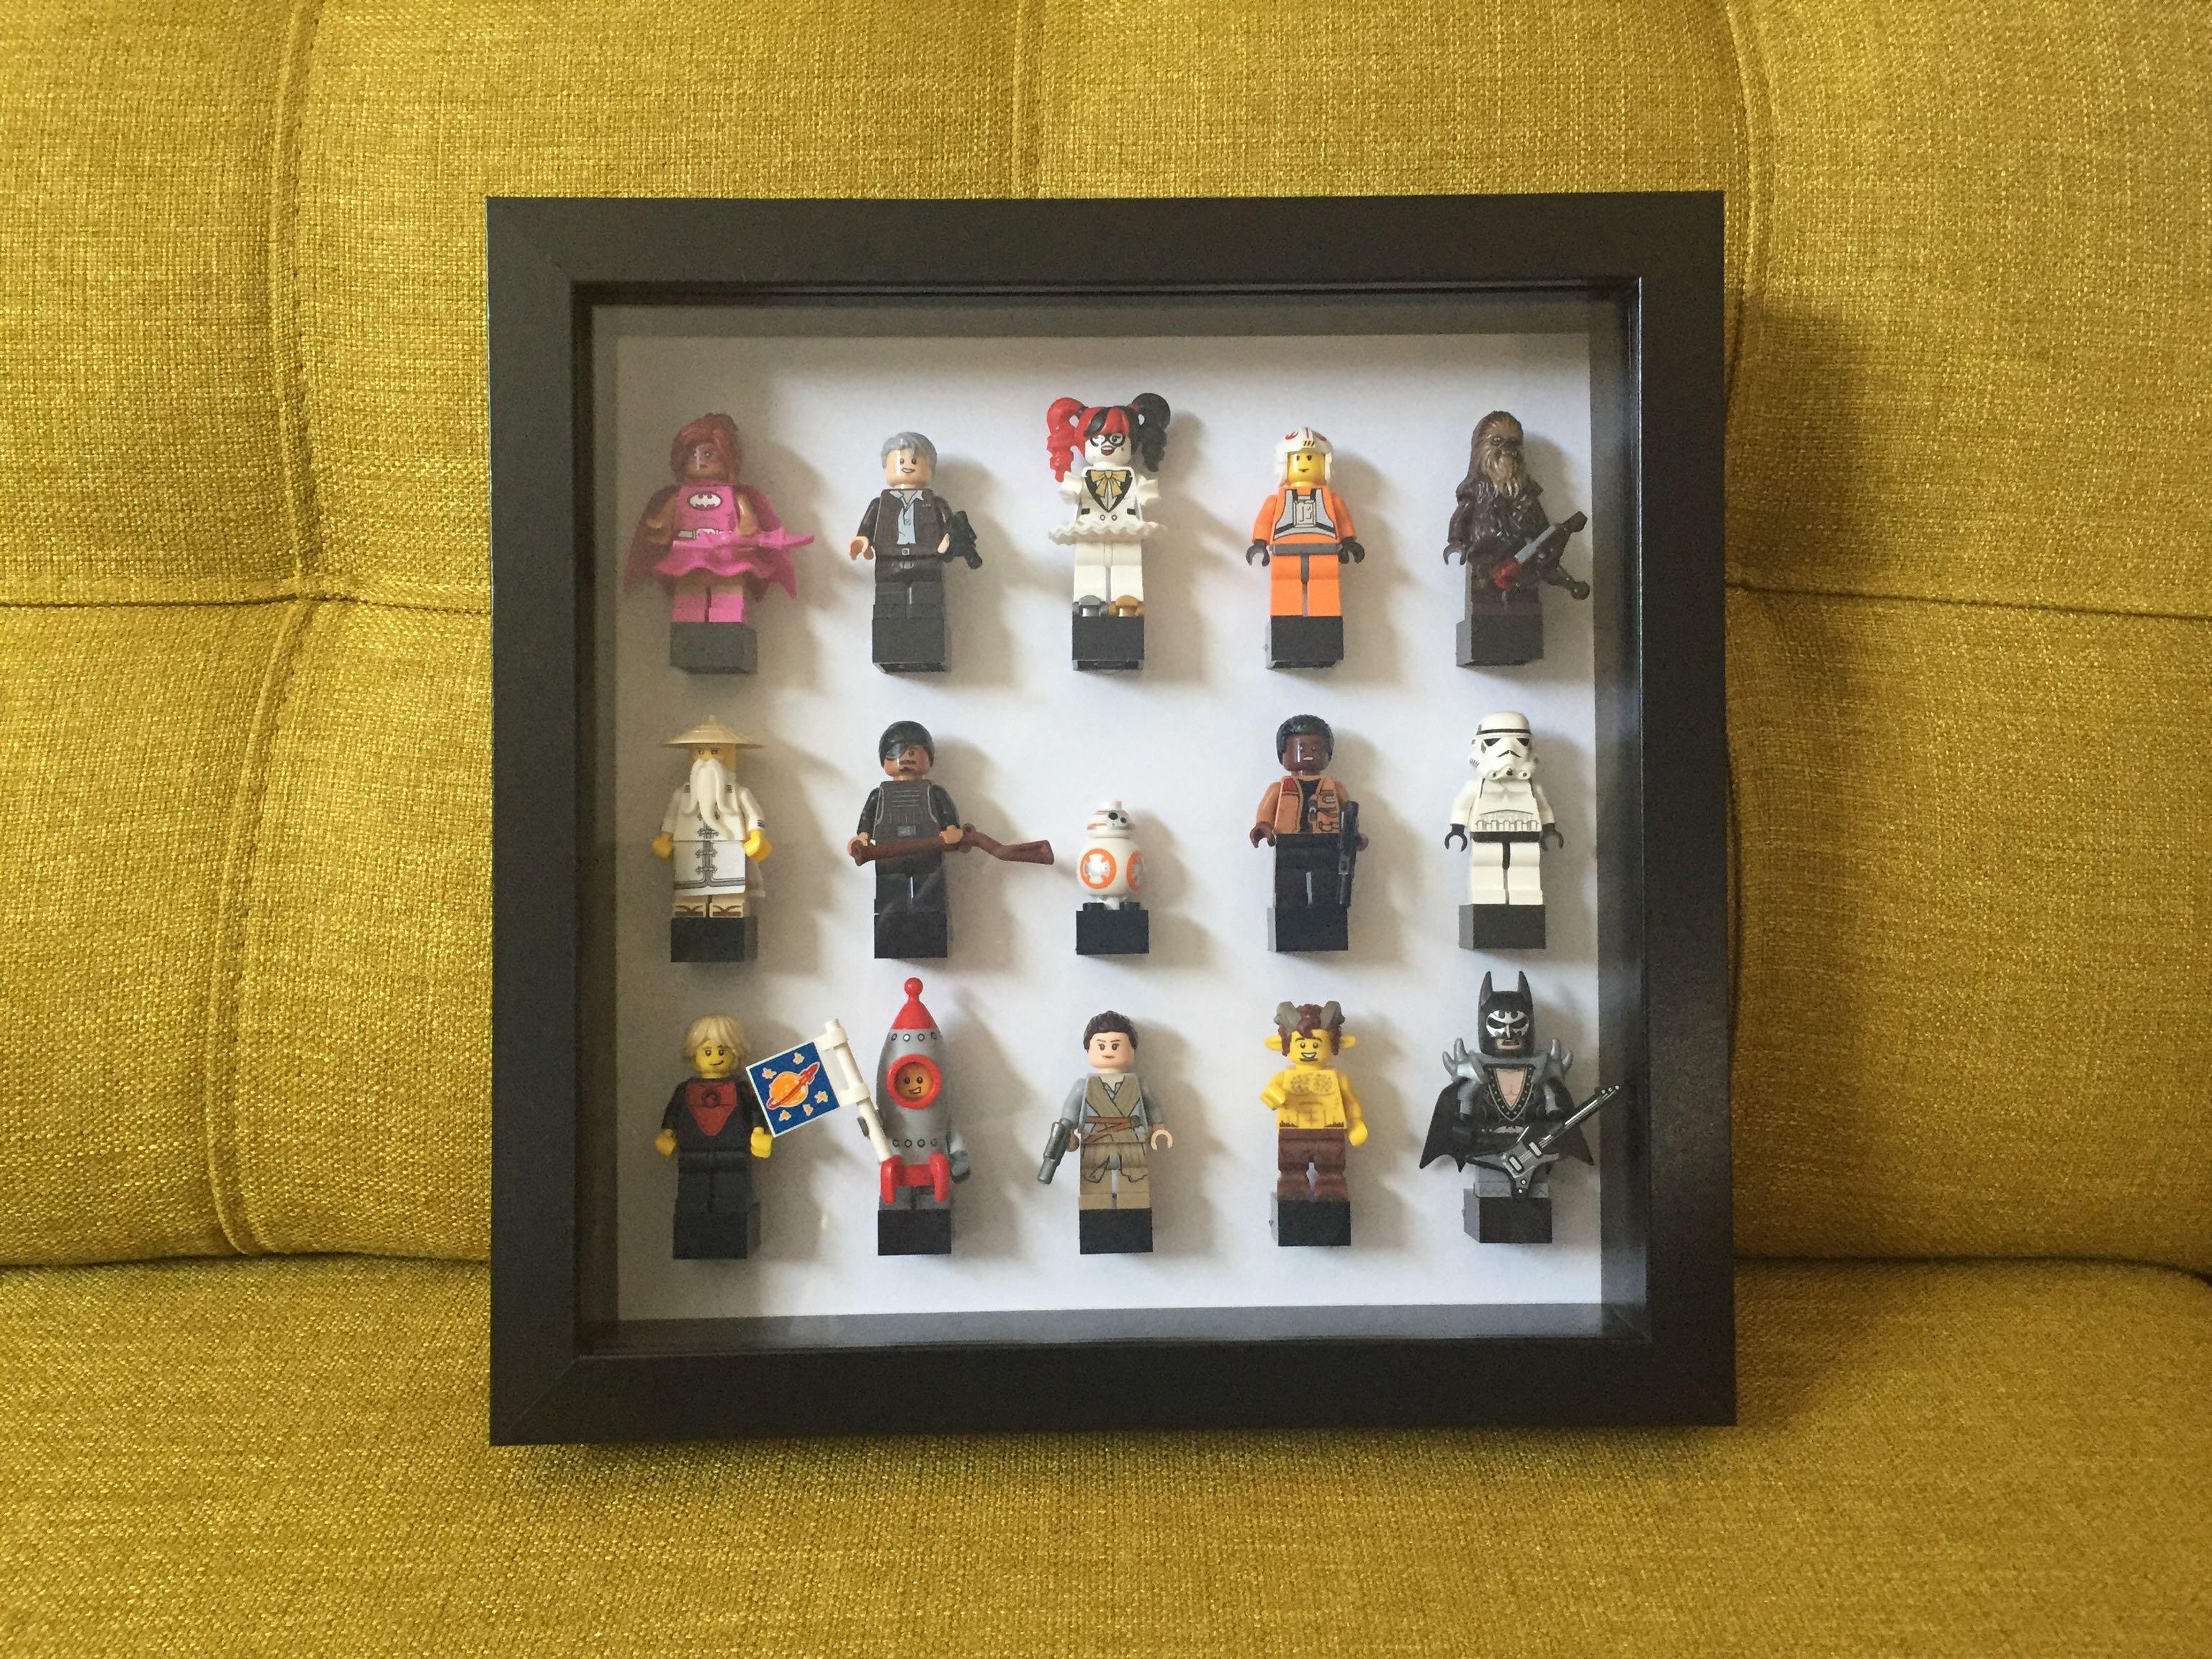 Genoeg Best Brand New - Lego Minifigure Display Case - Lego Minifig, Star @BT99